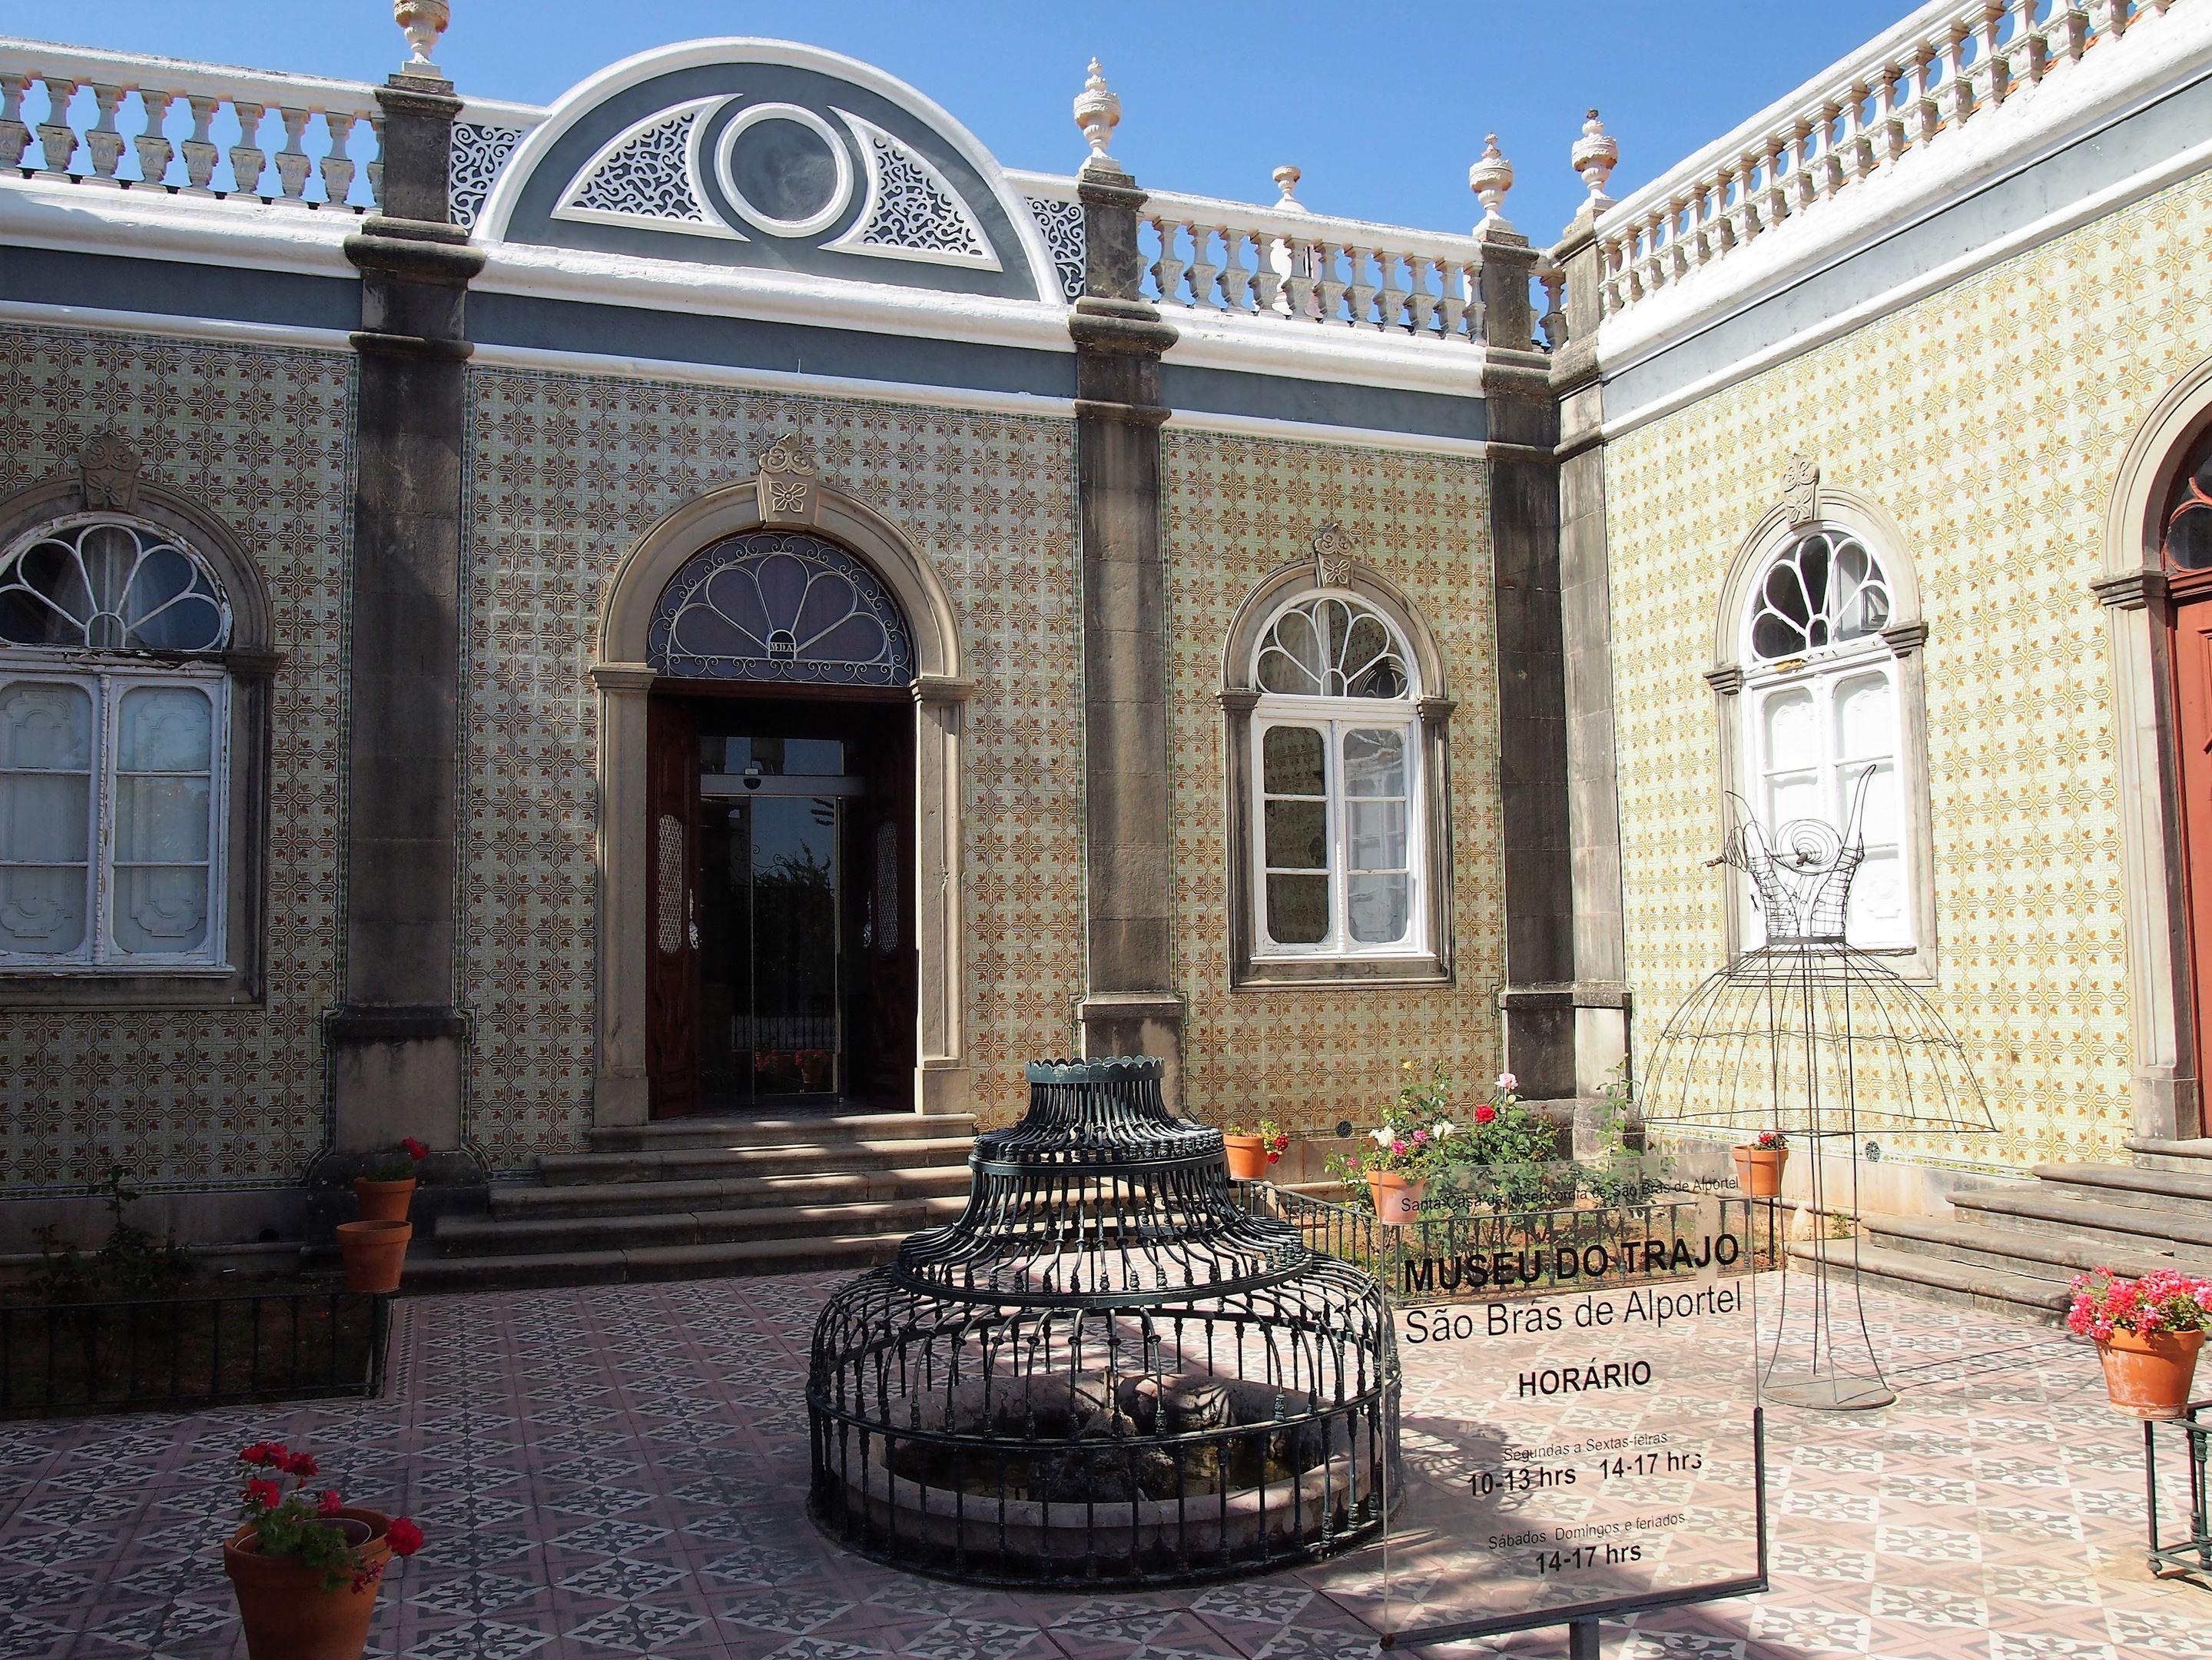 In the courtyard of the Algarve Costume Museum, São Brás de Alportel